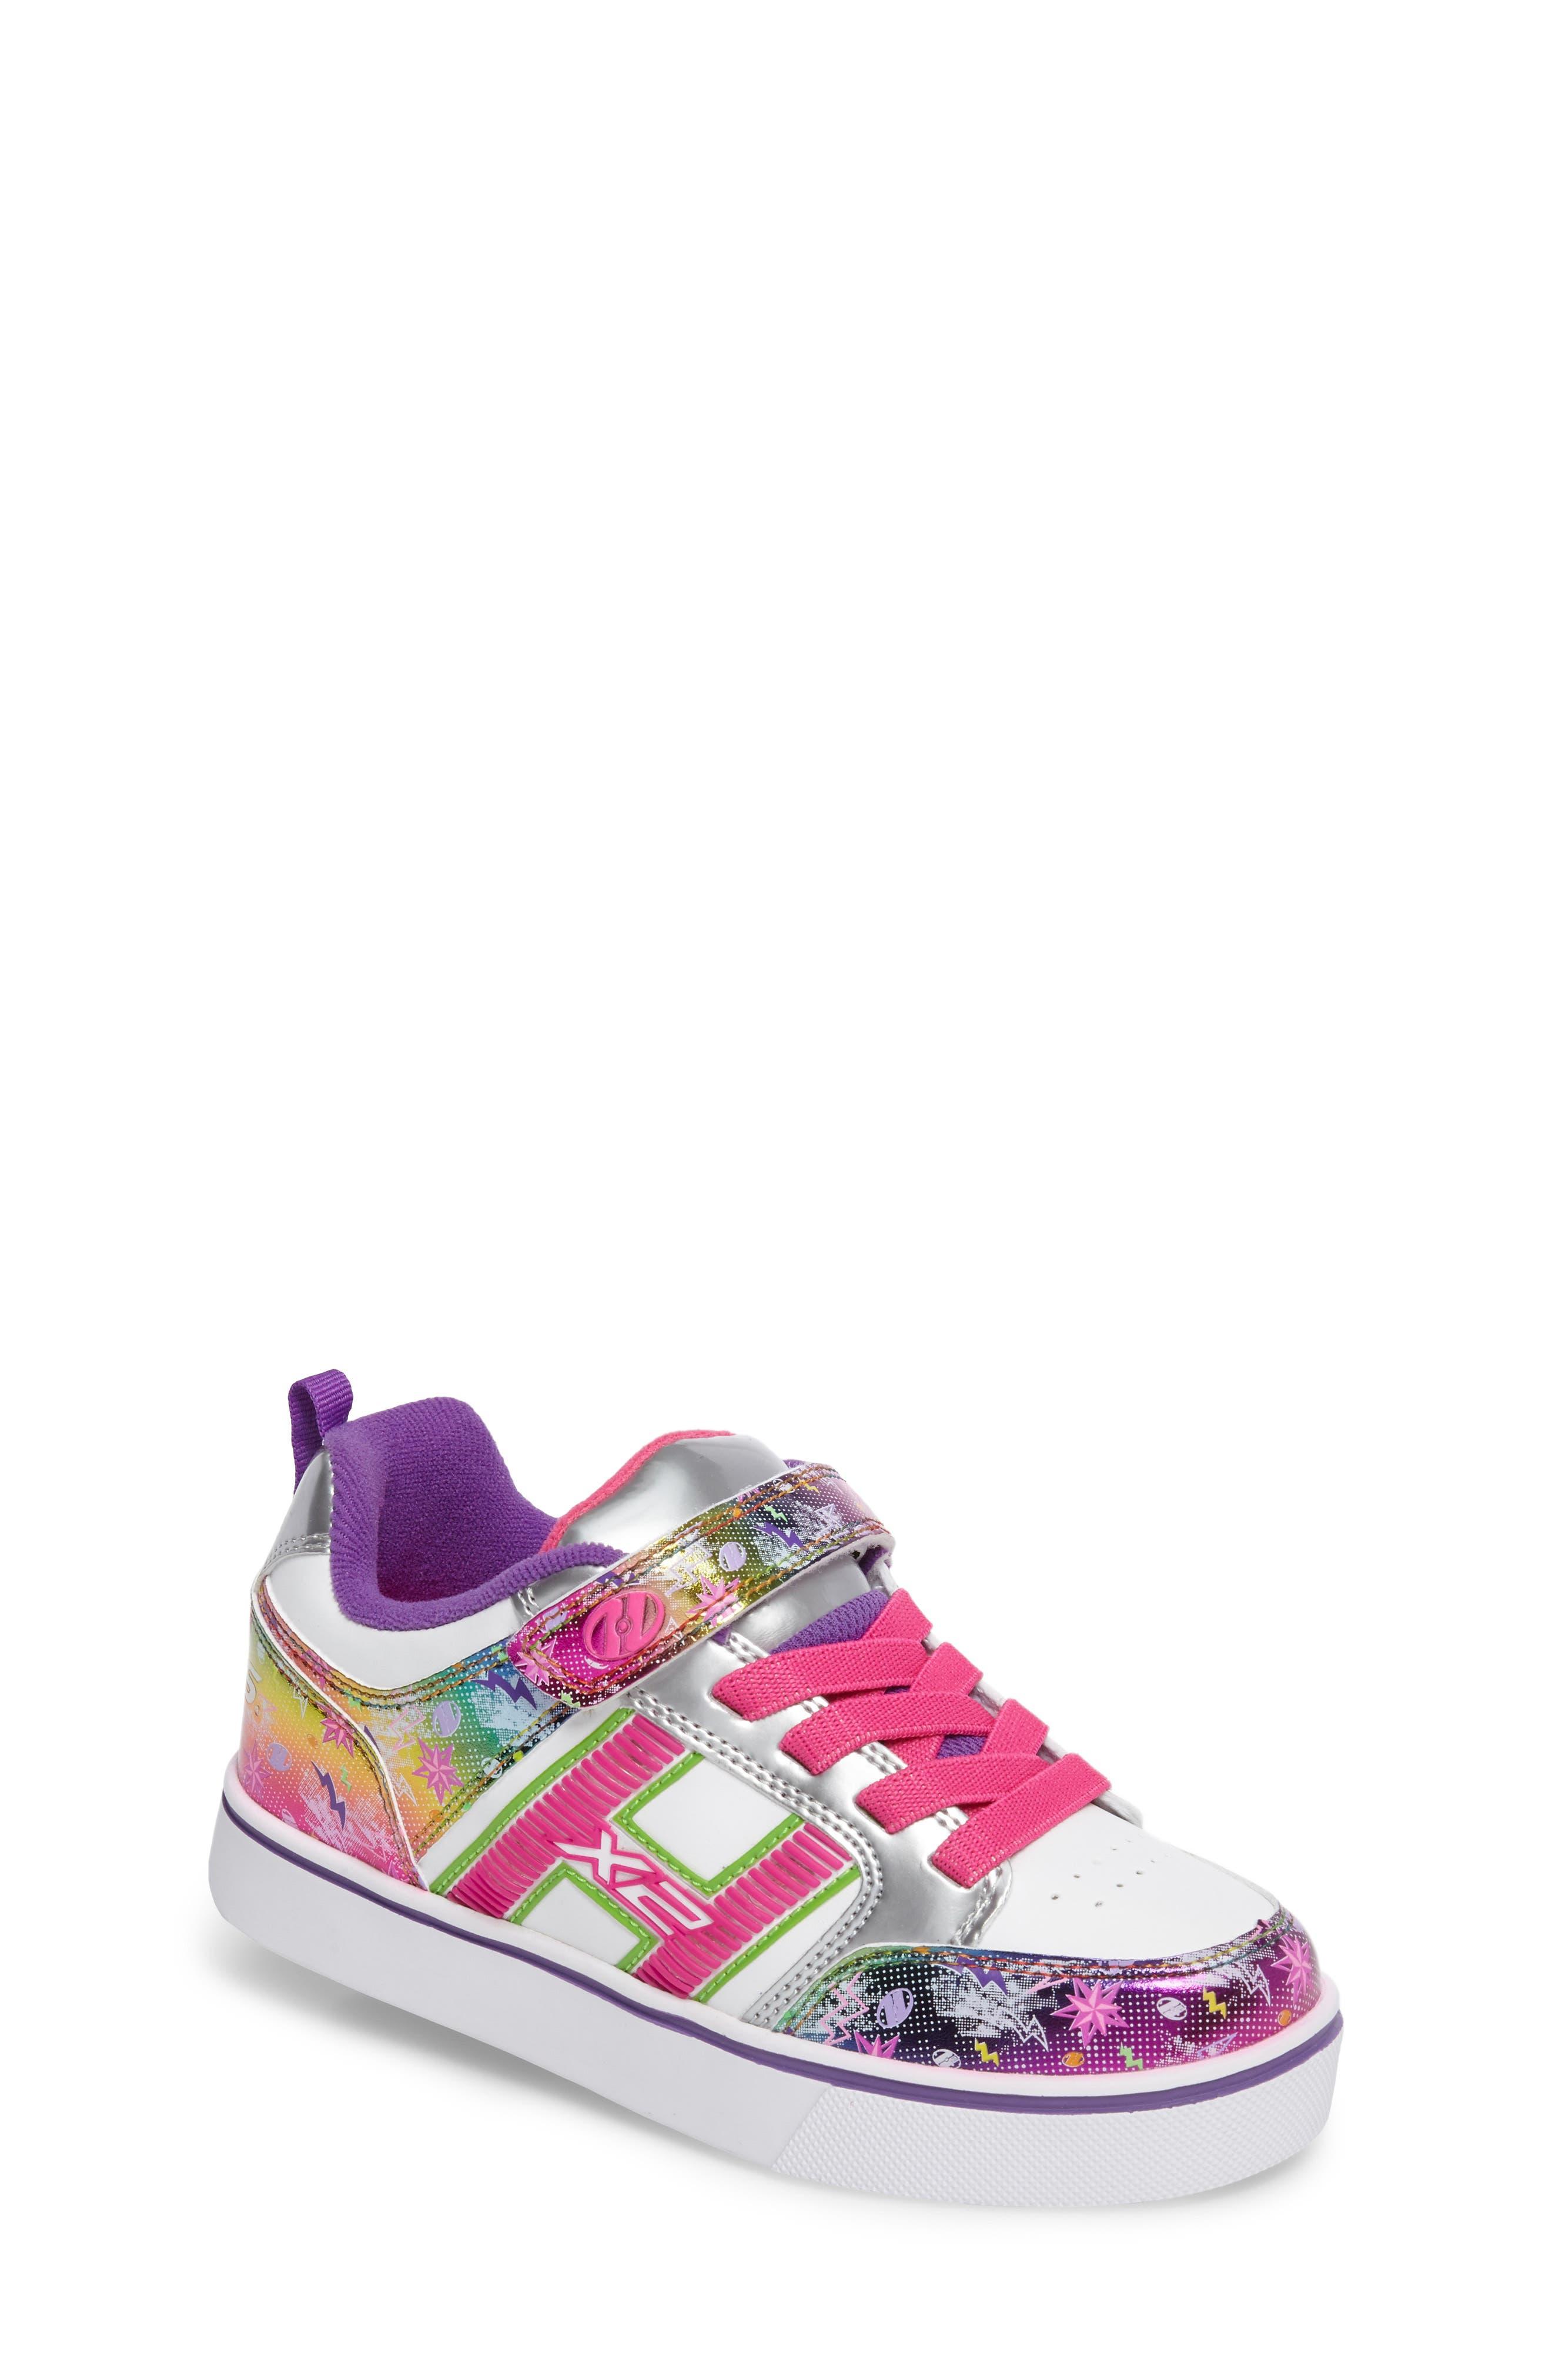 Bolt Plus X2 Light-Up Skate Sneaker,                         Main,                         color, 162